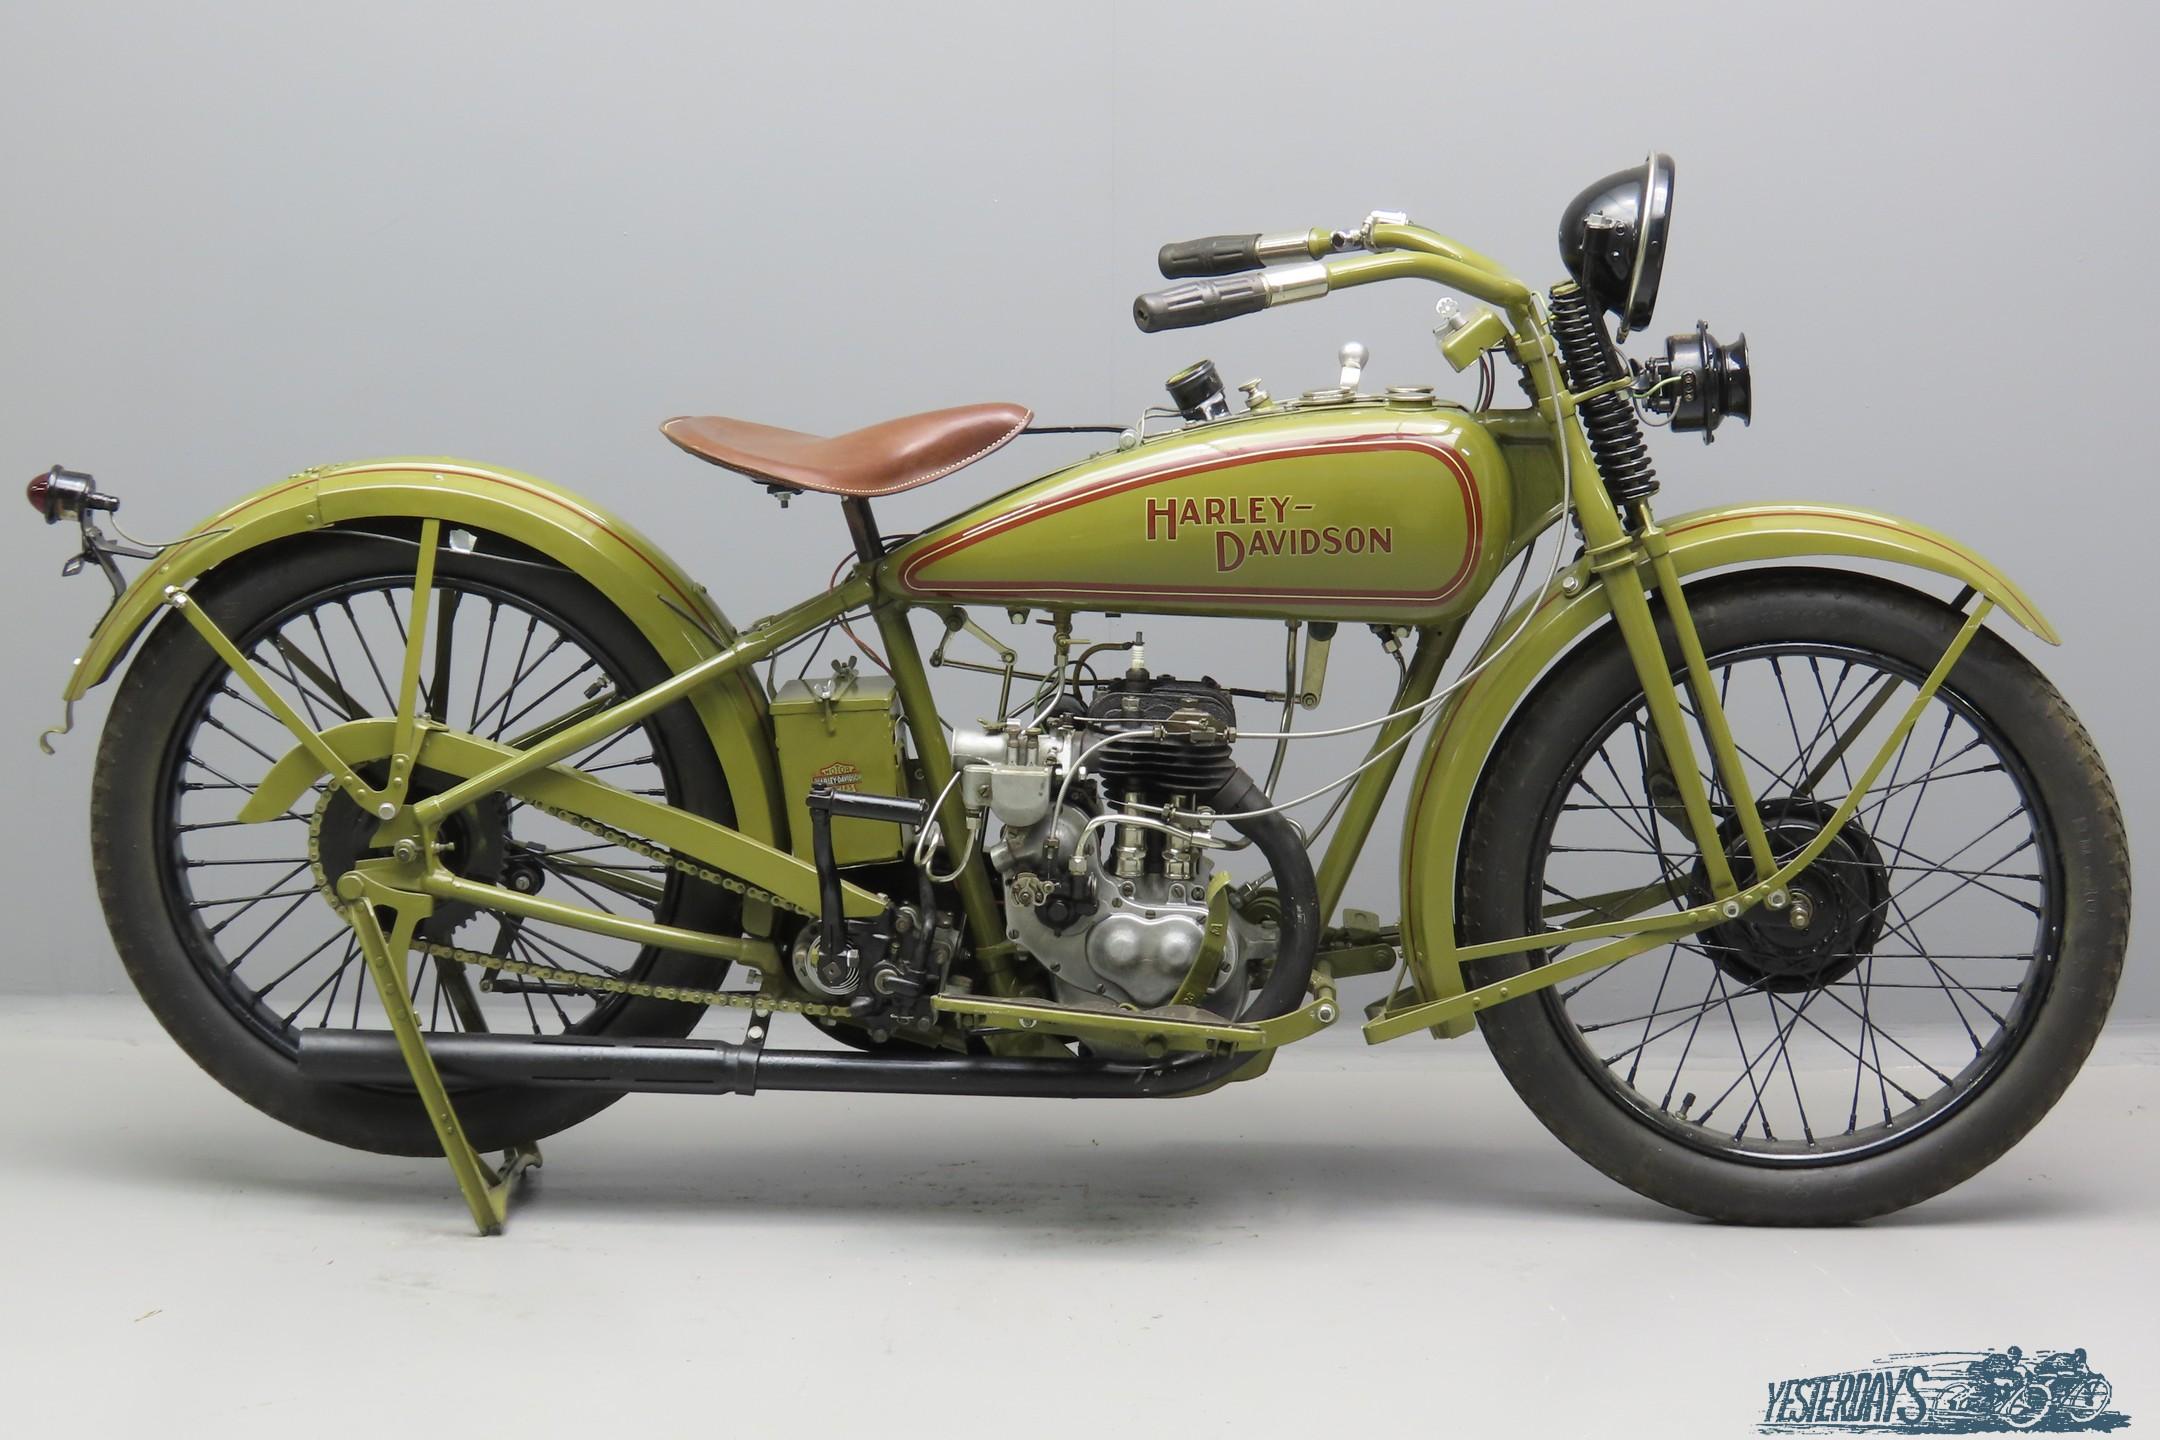 Harley Davidson 1928 Model B 350cc 1 cyl sv  3007